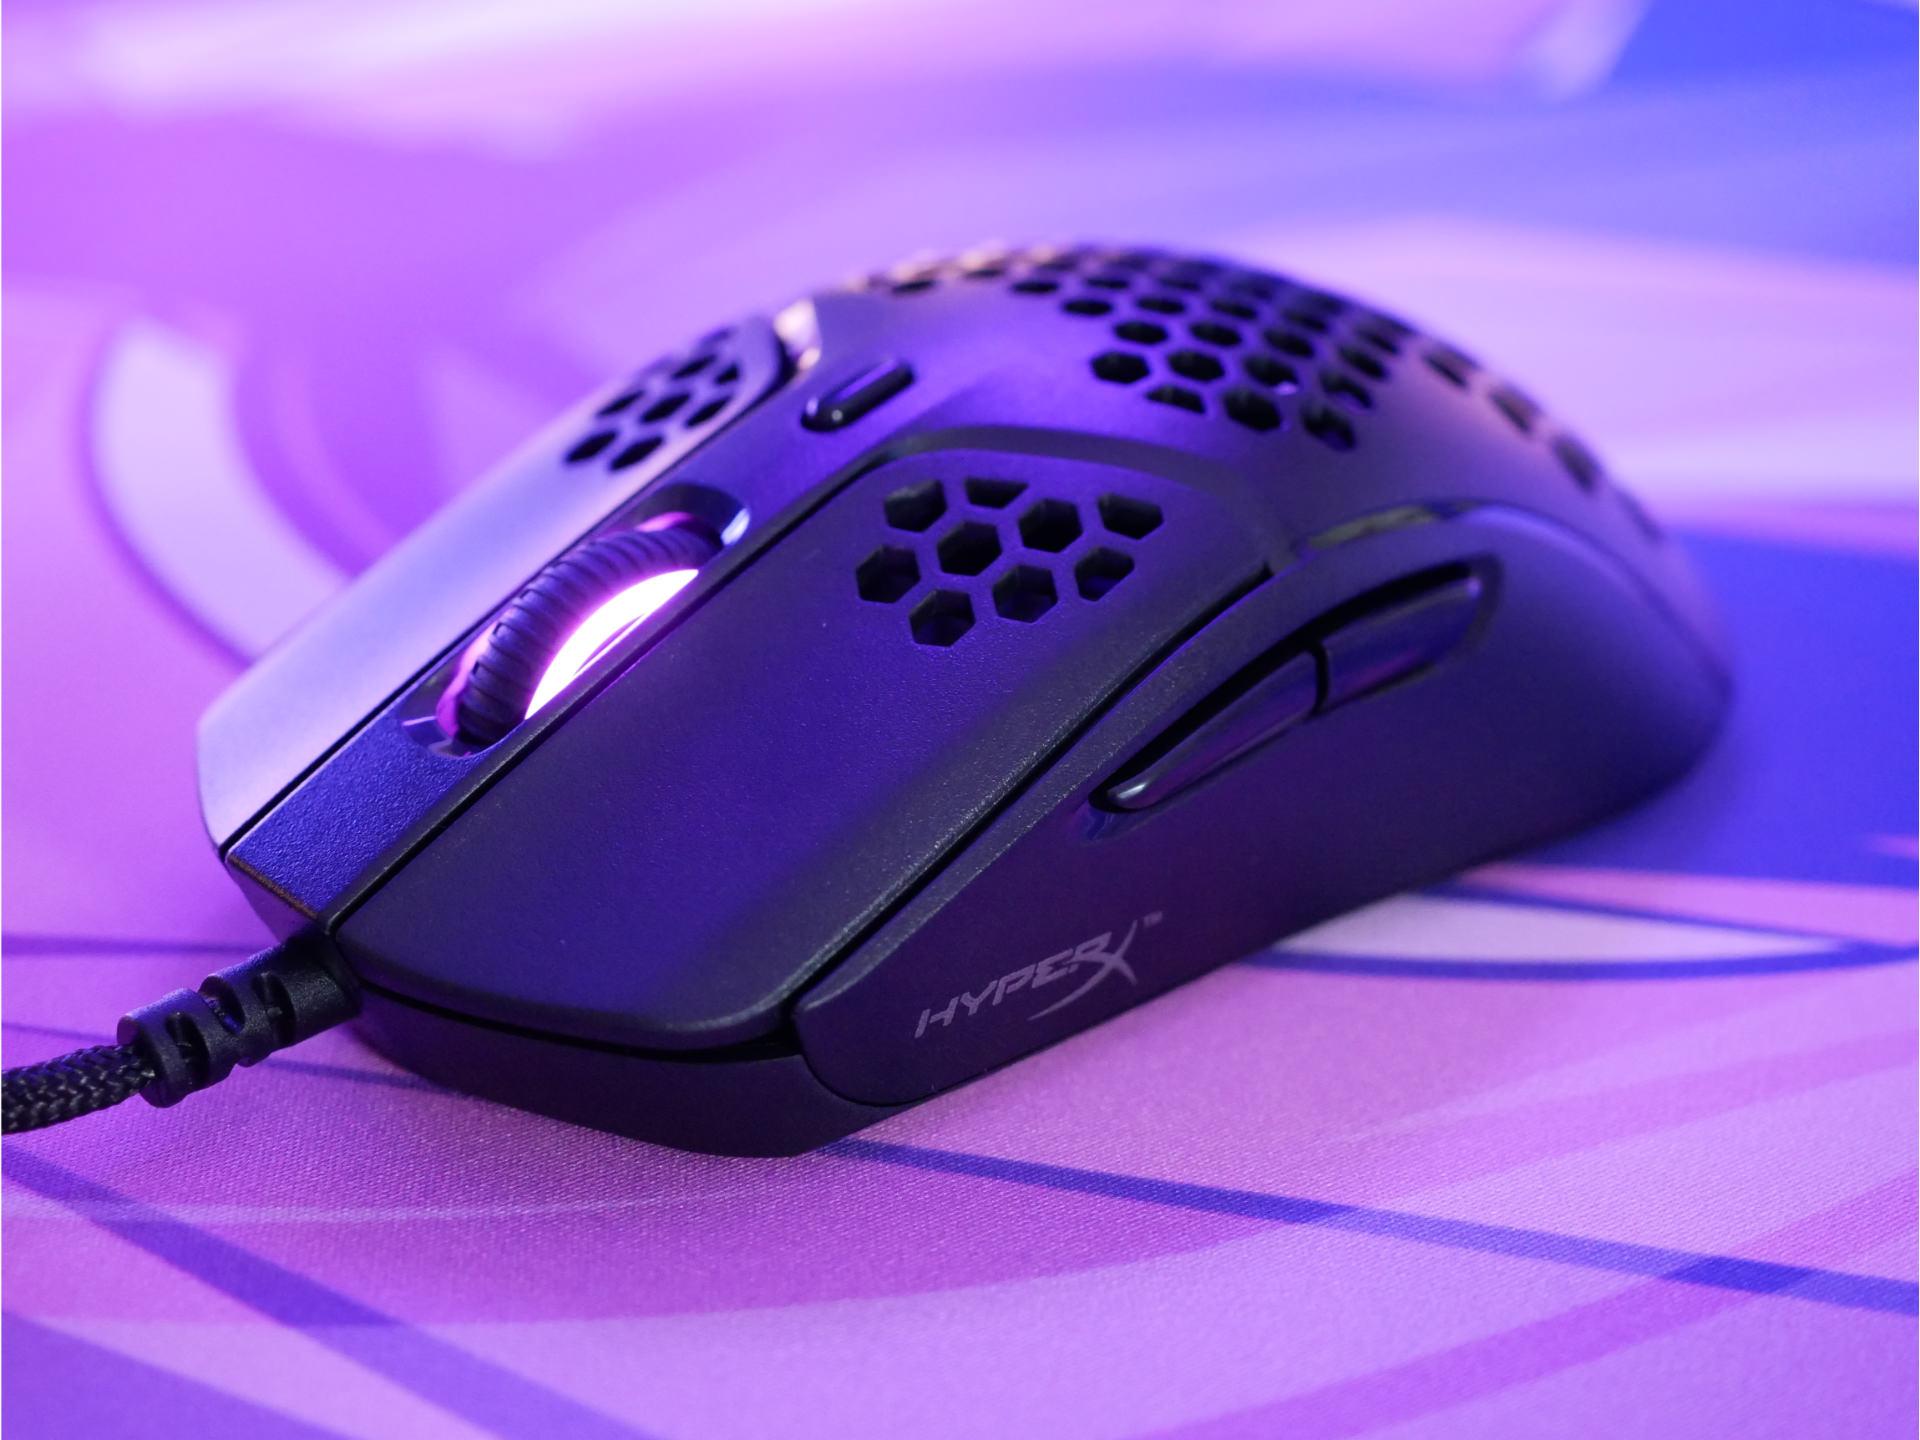 「HyperX Pulsefire Haste」レビュー。ハイクオリティで安価な超軽量ゲーミングマウス